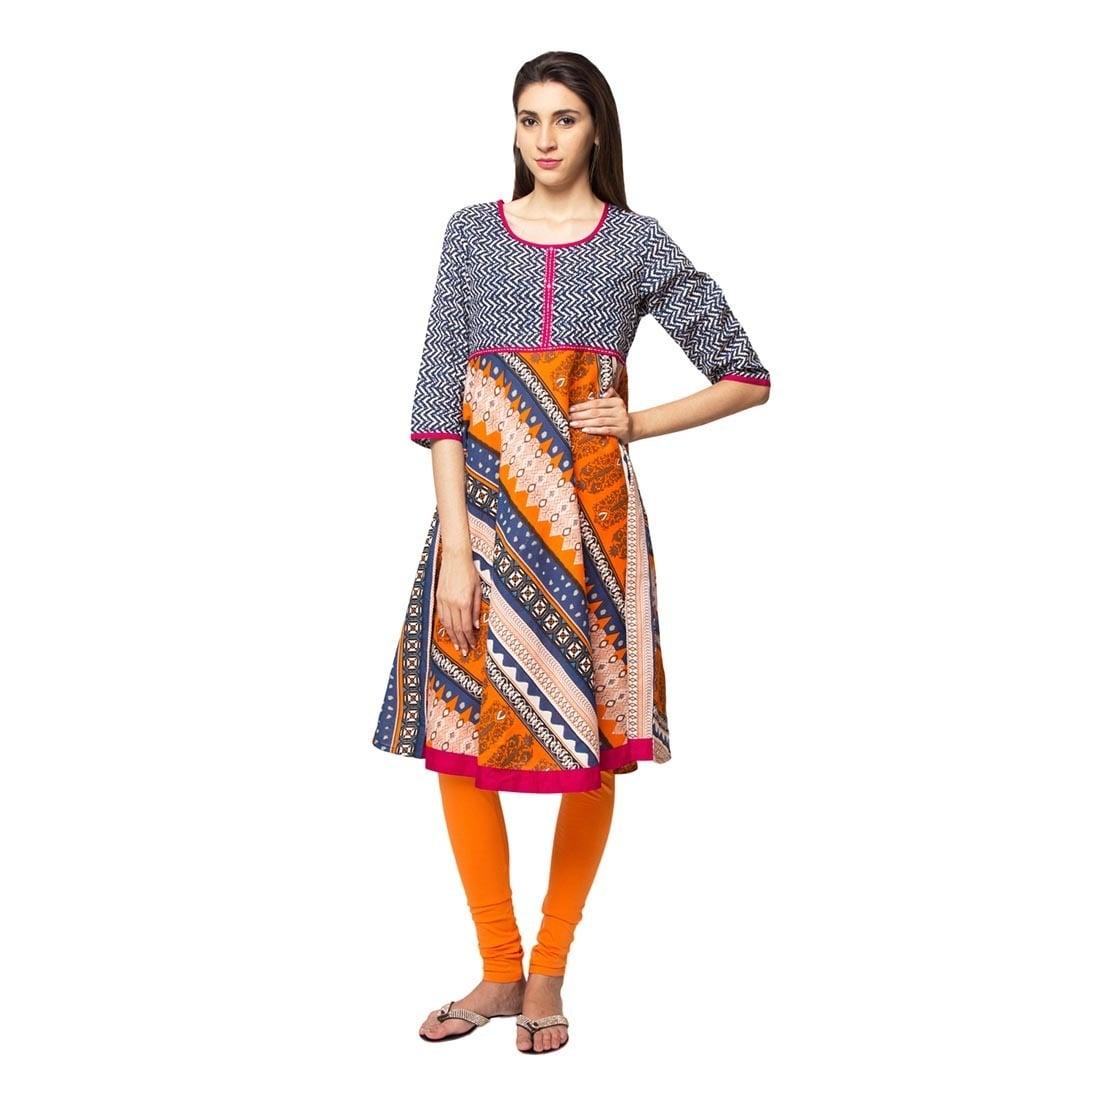 da33cbe9252 Handmade In-Sattva Ethnicity Women's Indian Trendy Multi-Print Kurta Tunic  (India)